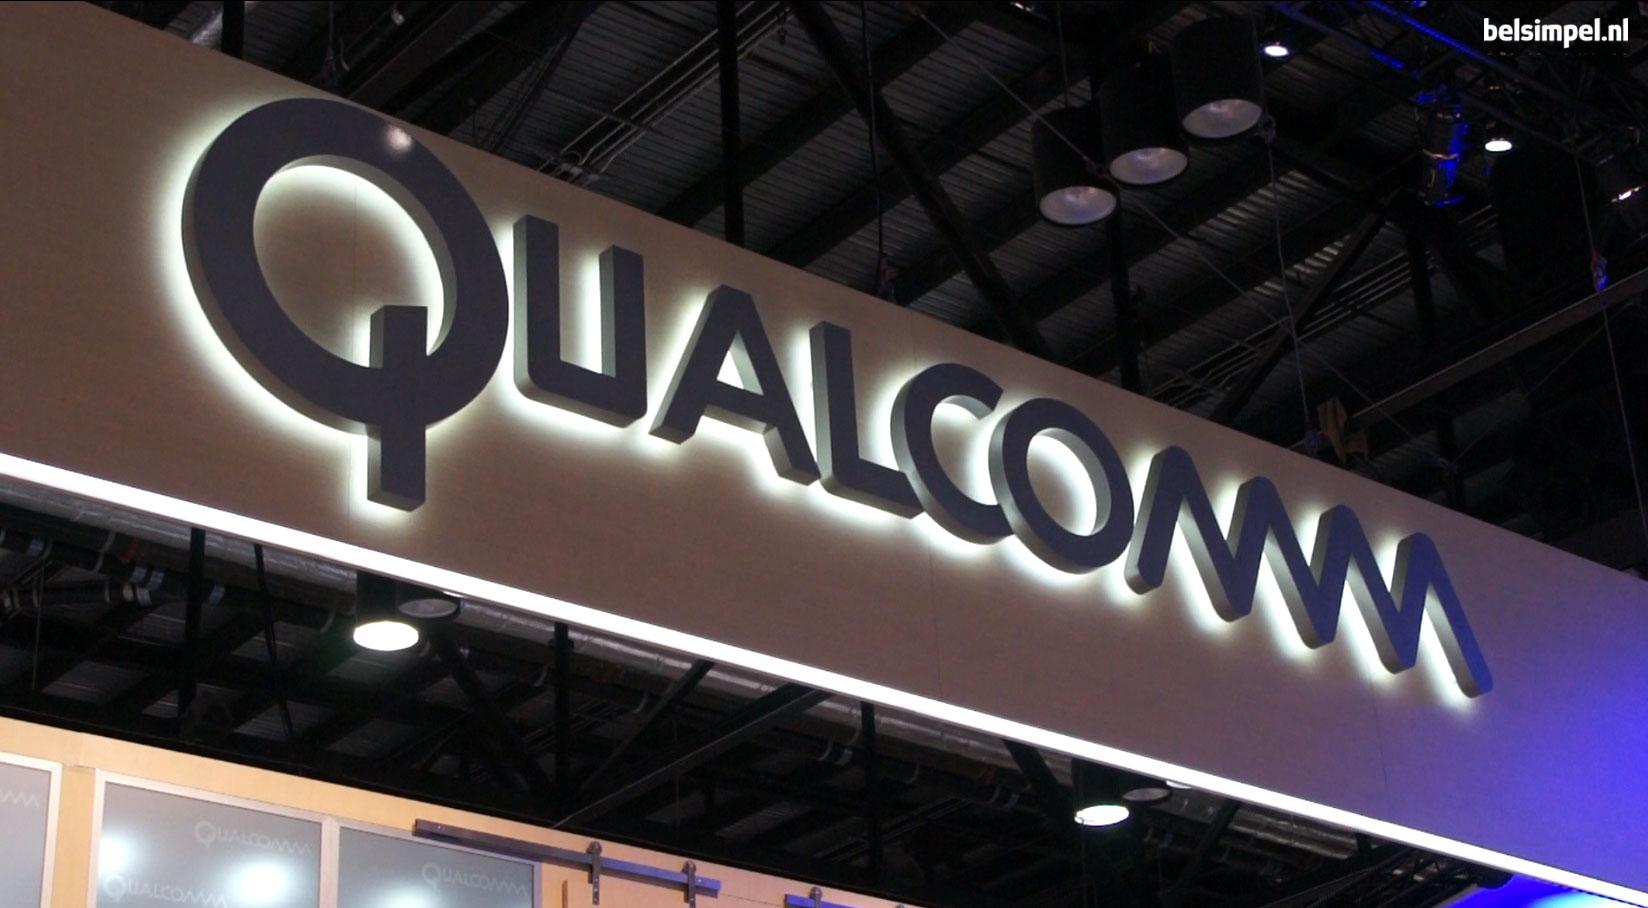 Hij komt eraan: de supersnelle Snapdragon 835 processor!